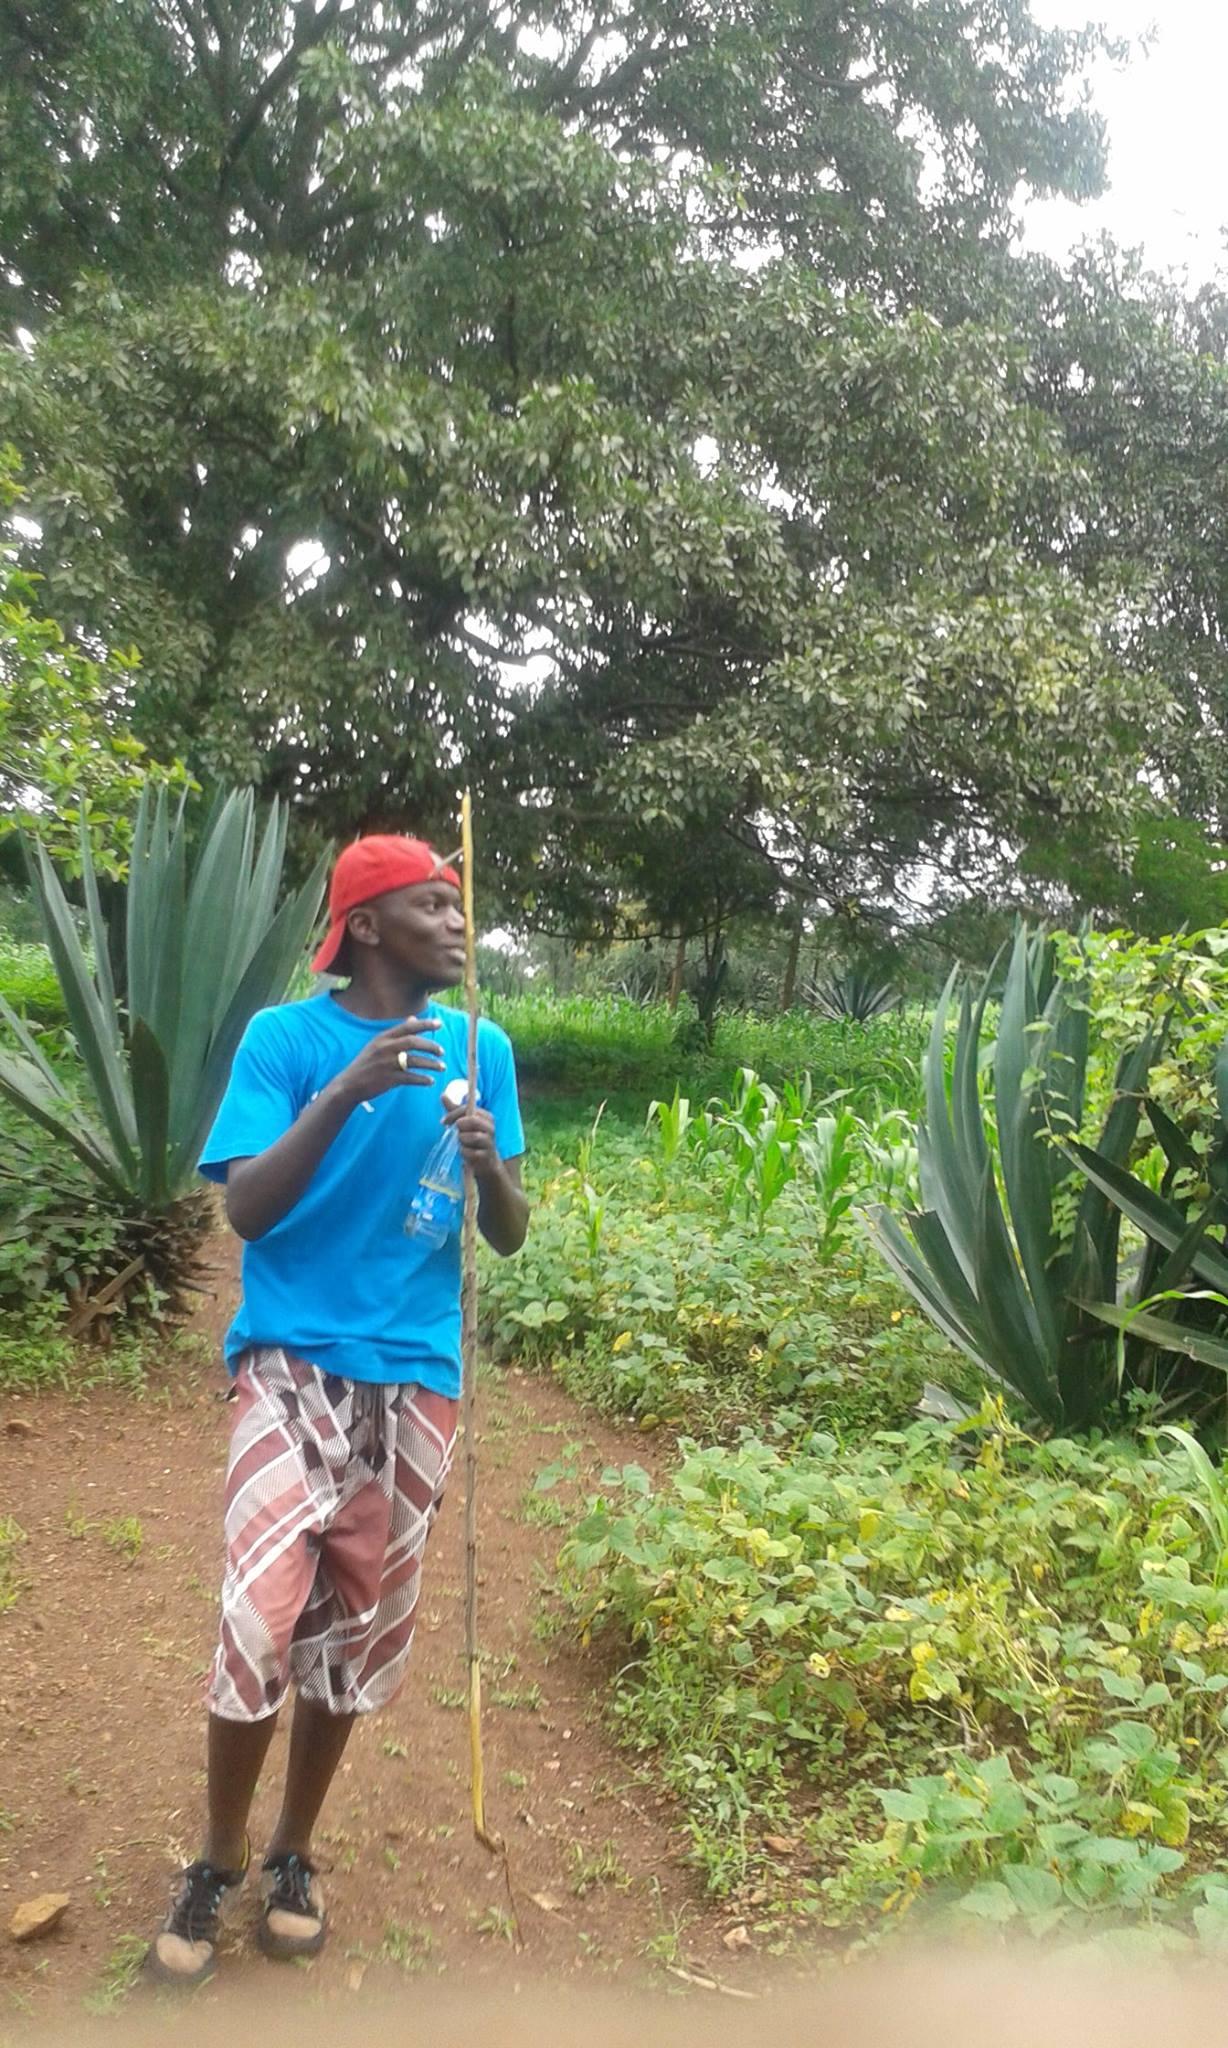 Mount kigali